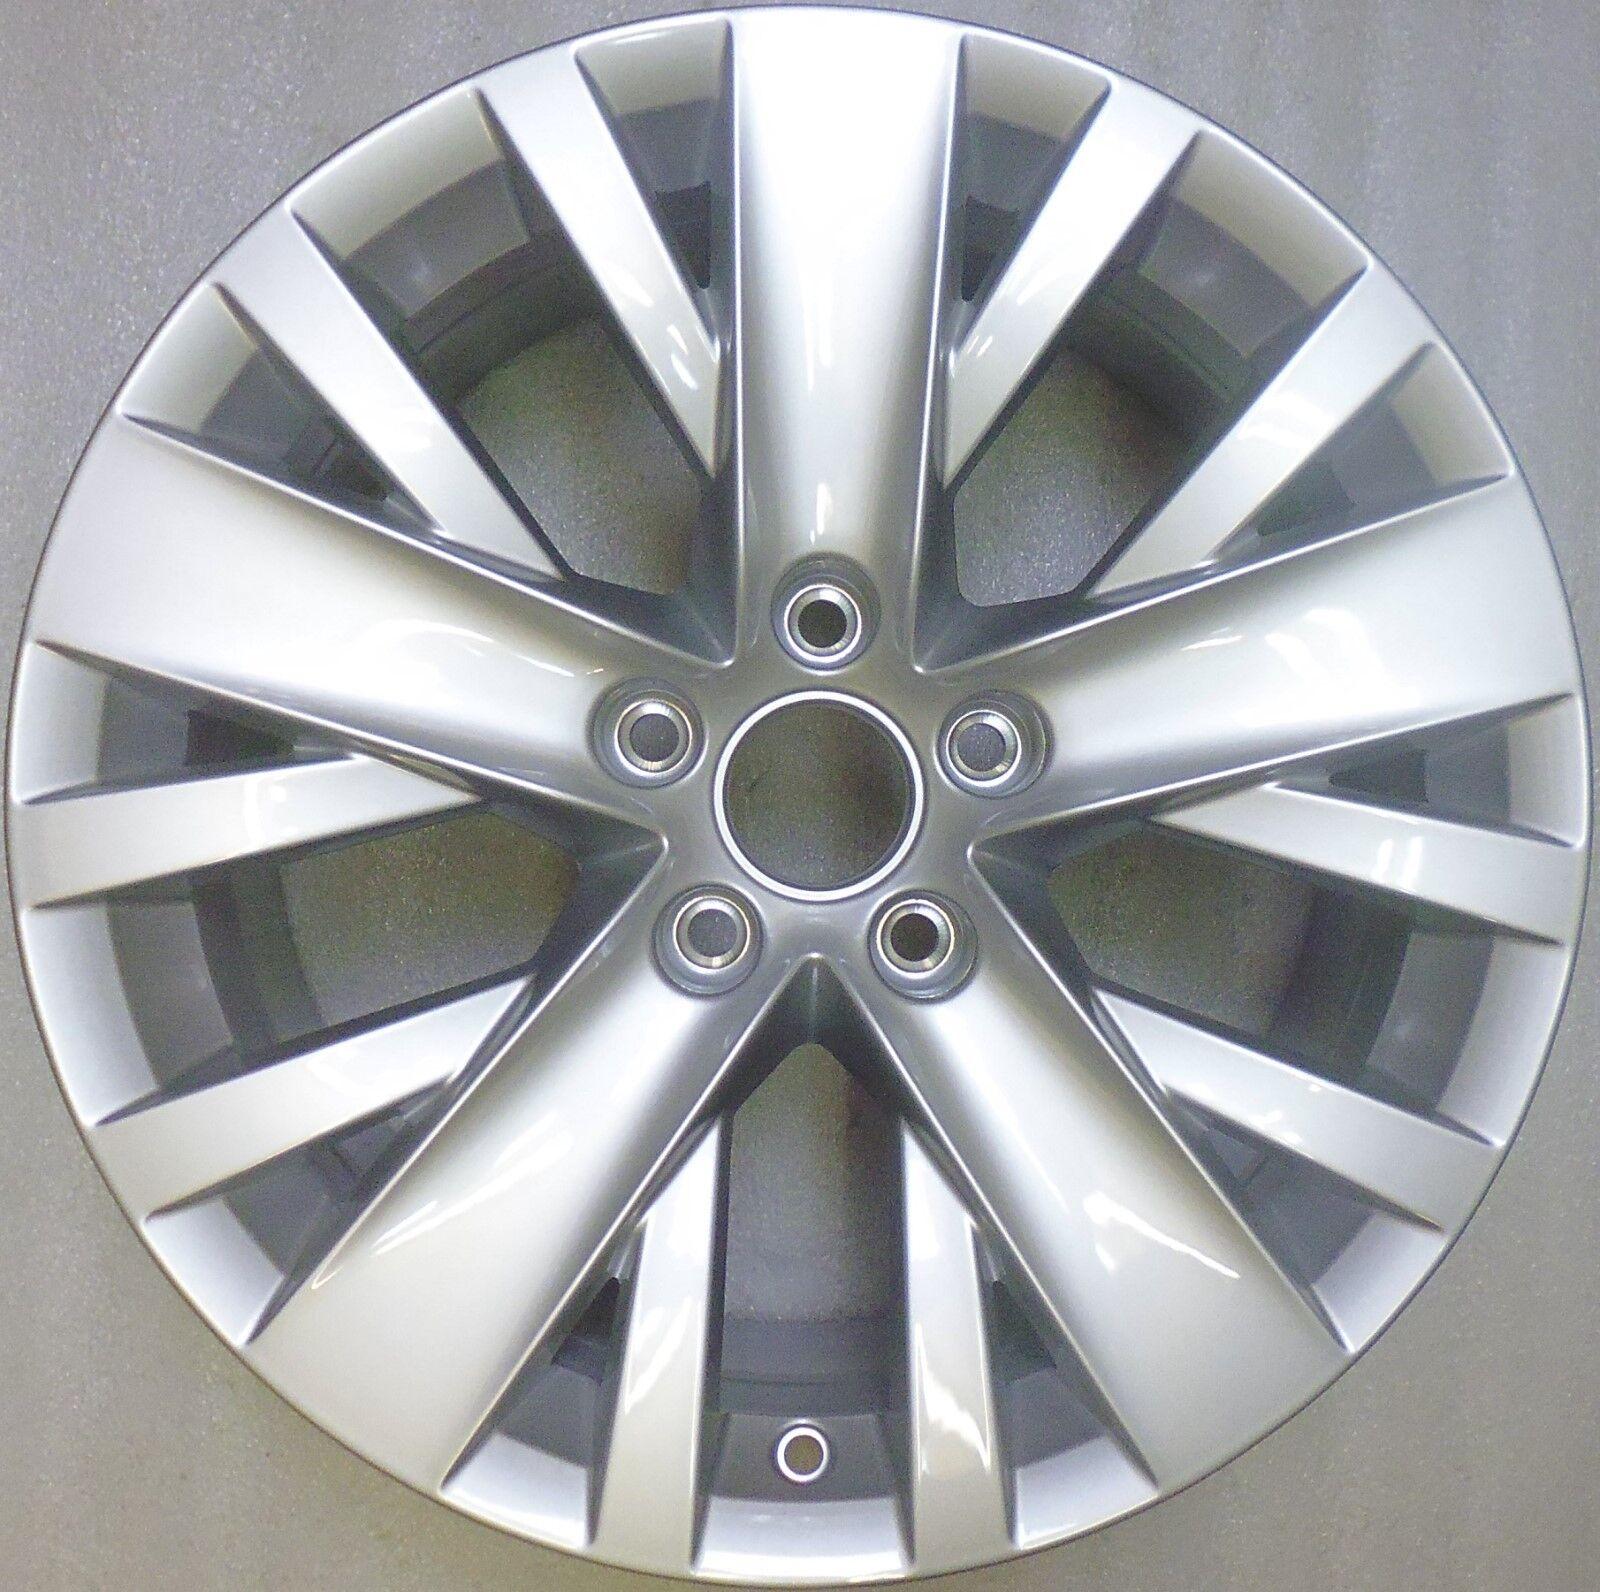 Alufelge 8x17 ET41 VW Scirocco 1K8601025J Spokane jante rim wheel ...